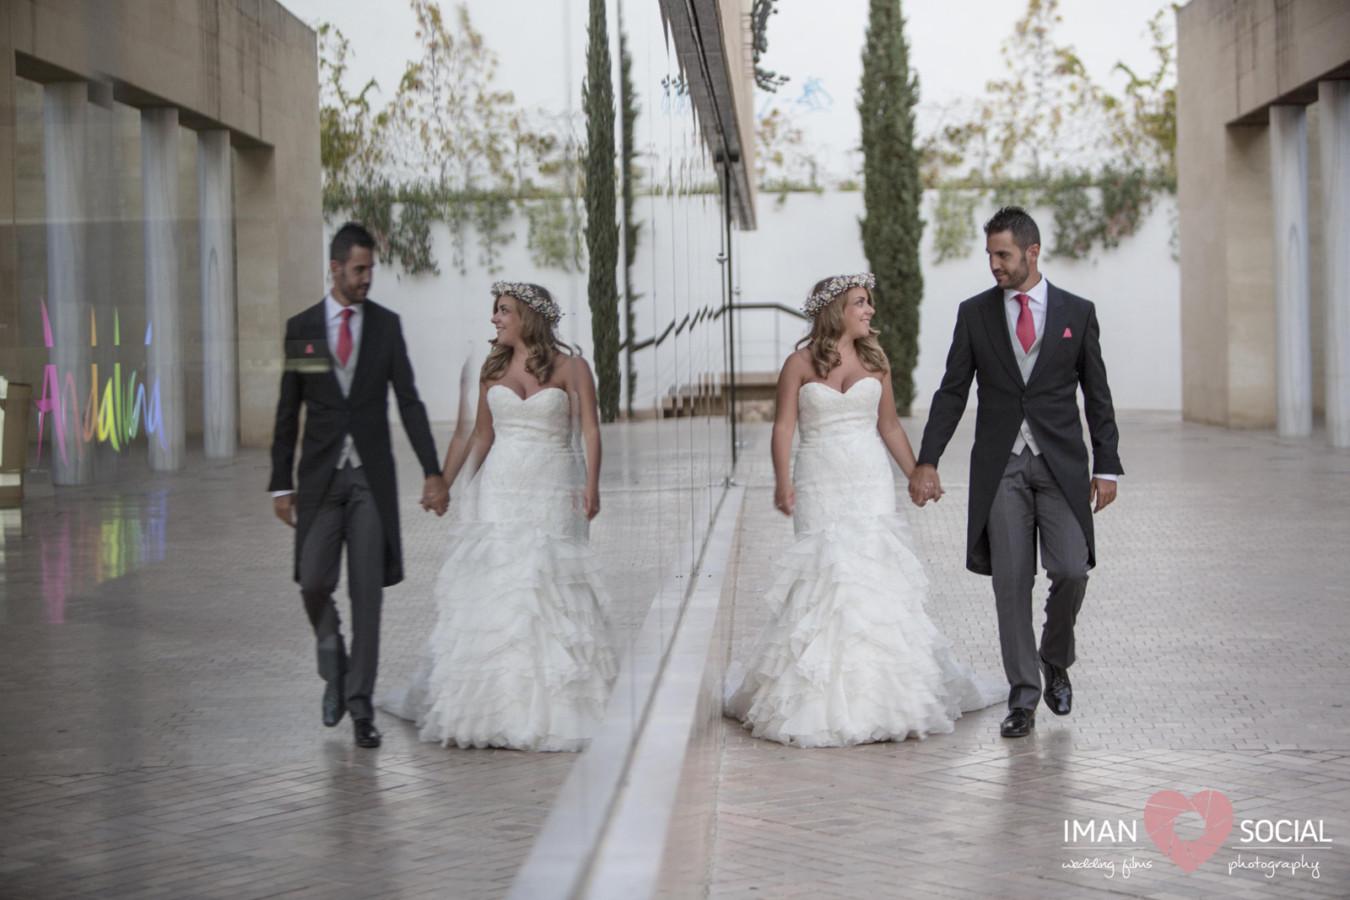 77B1117 Juan Antonio y Mónica - Postboda - video boda cordoba